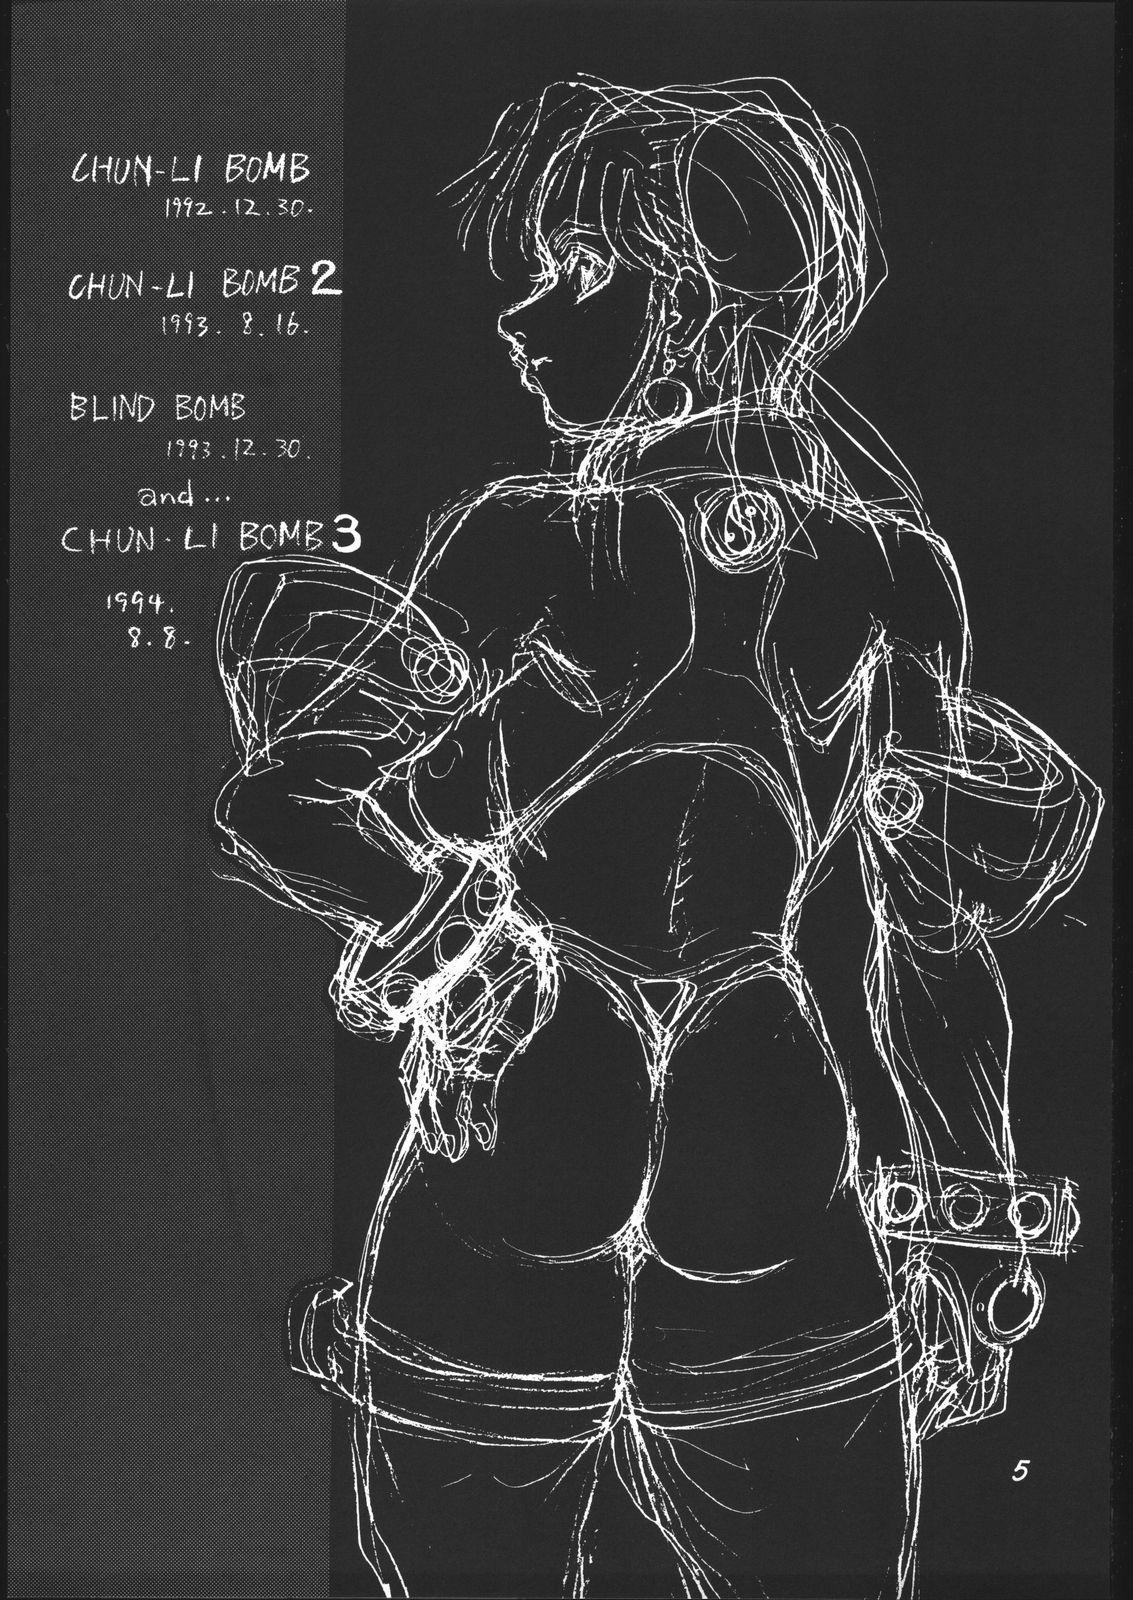 Chun-Li Side A 5